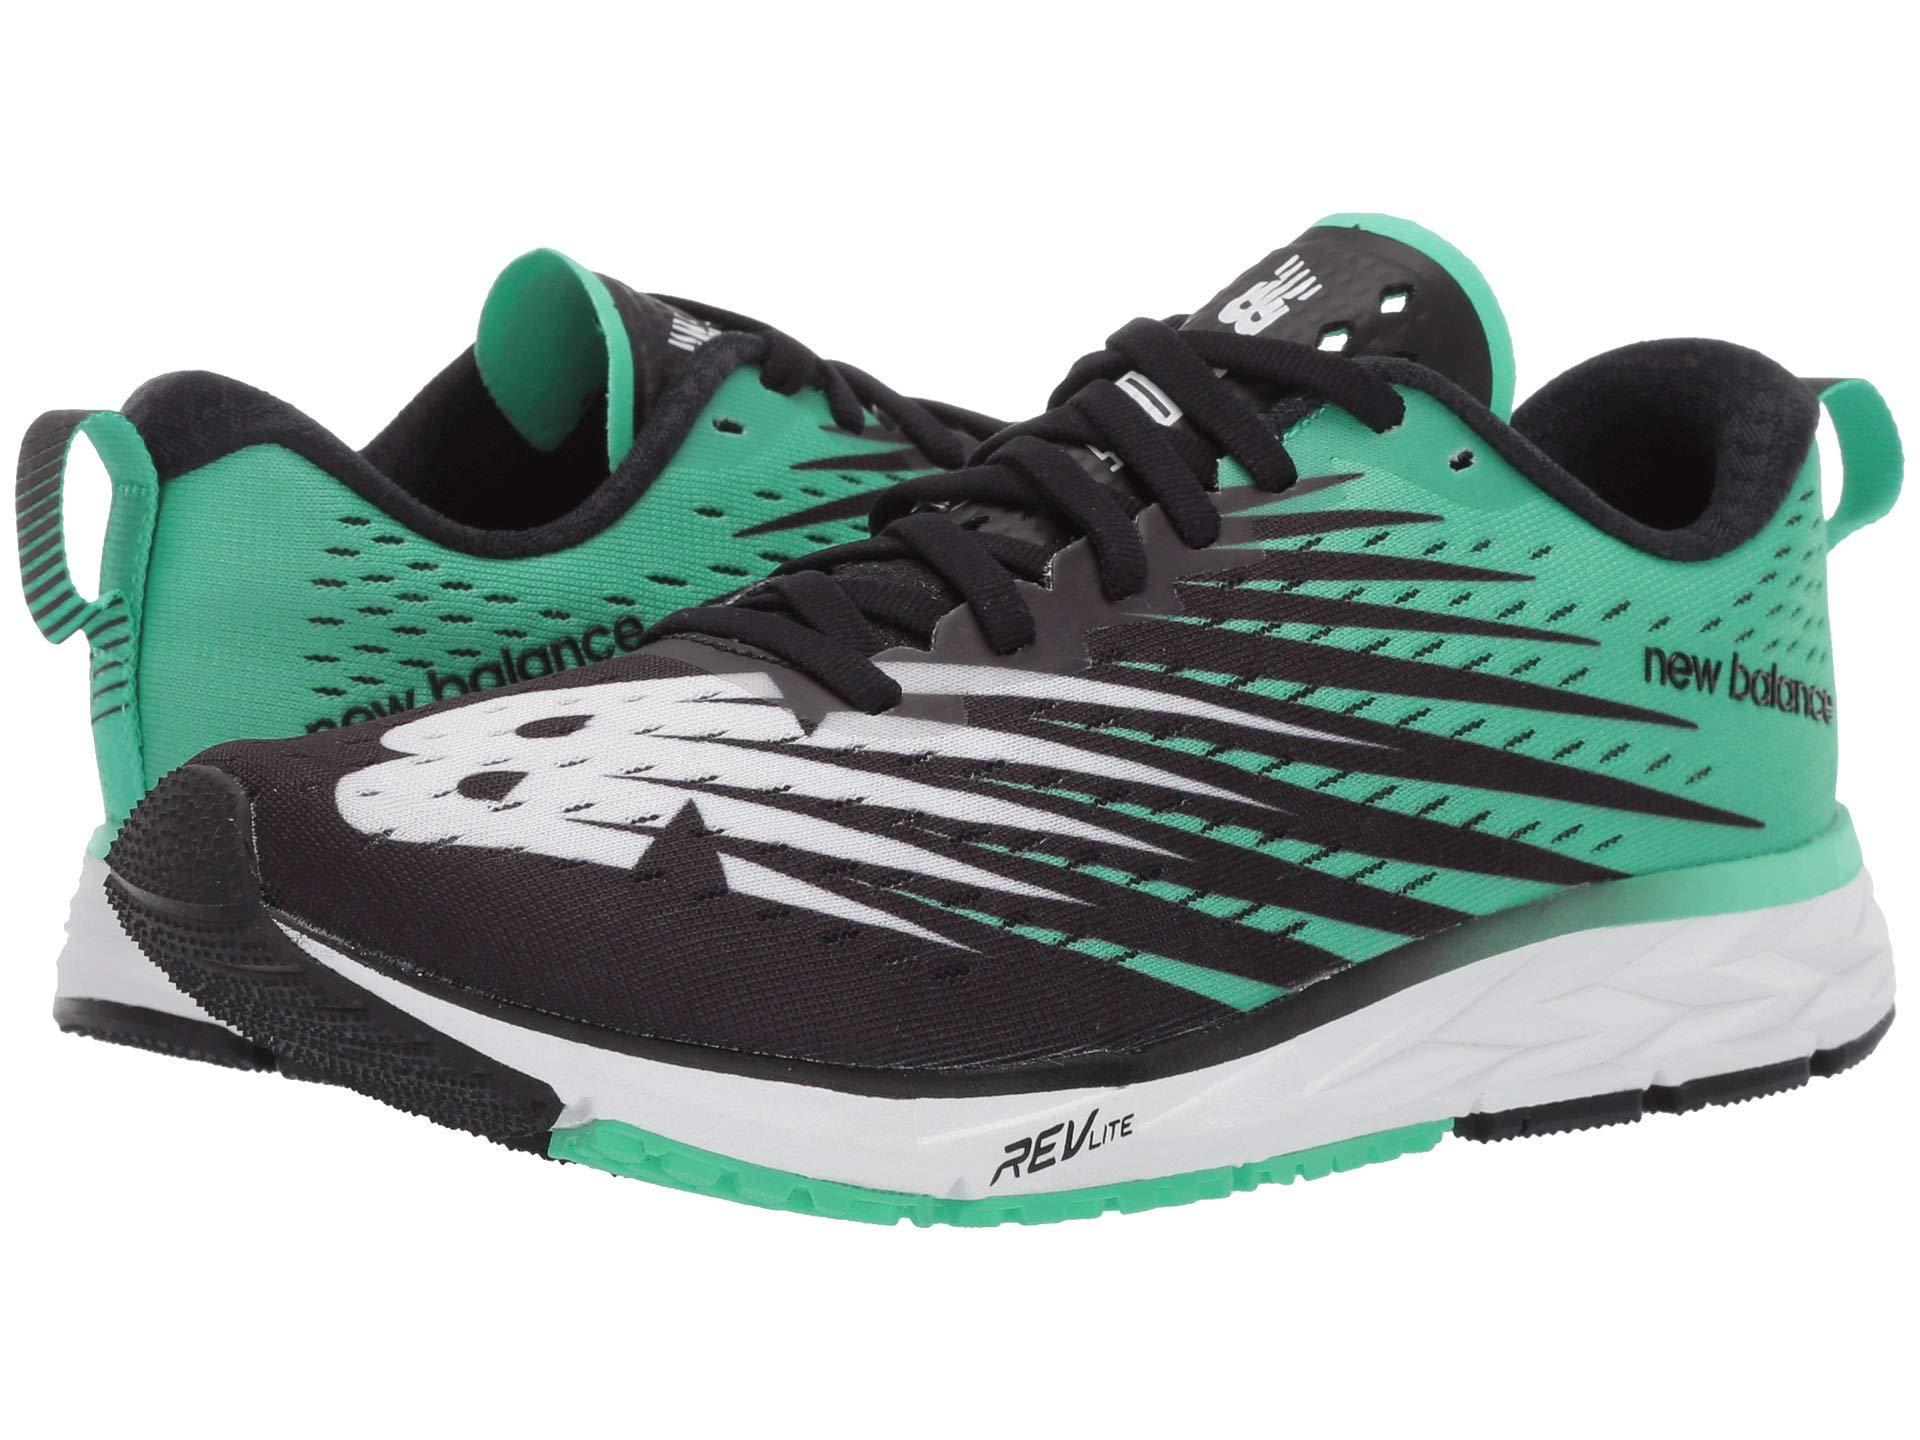 4d249e64984b Lyst - New Balance 1500v5 (uv Blue dark Mango) Men s Running Shoes ...